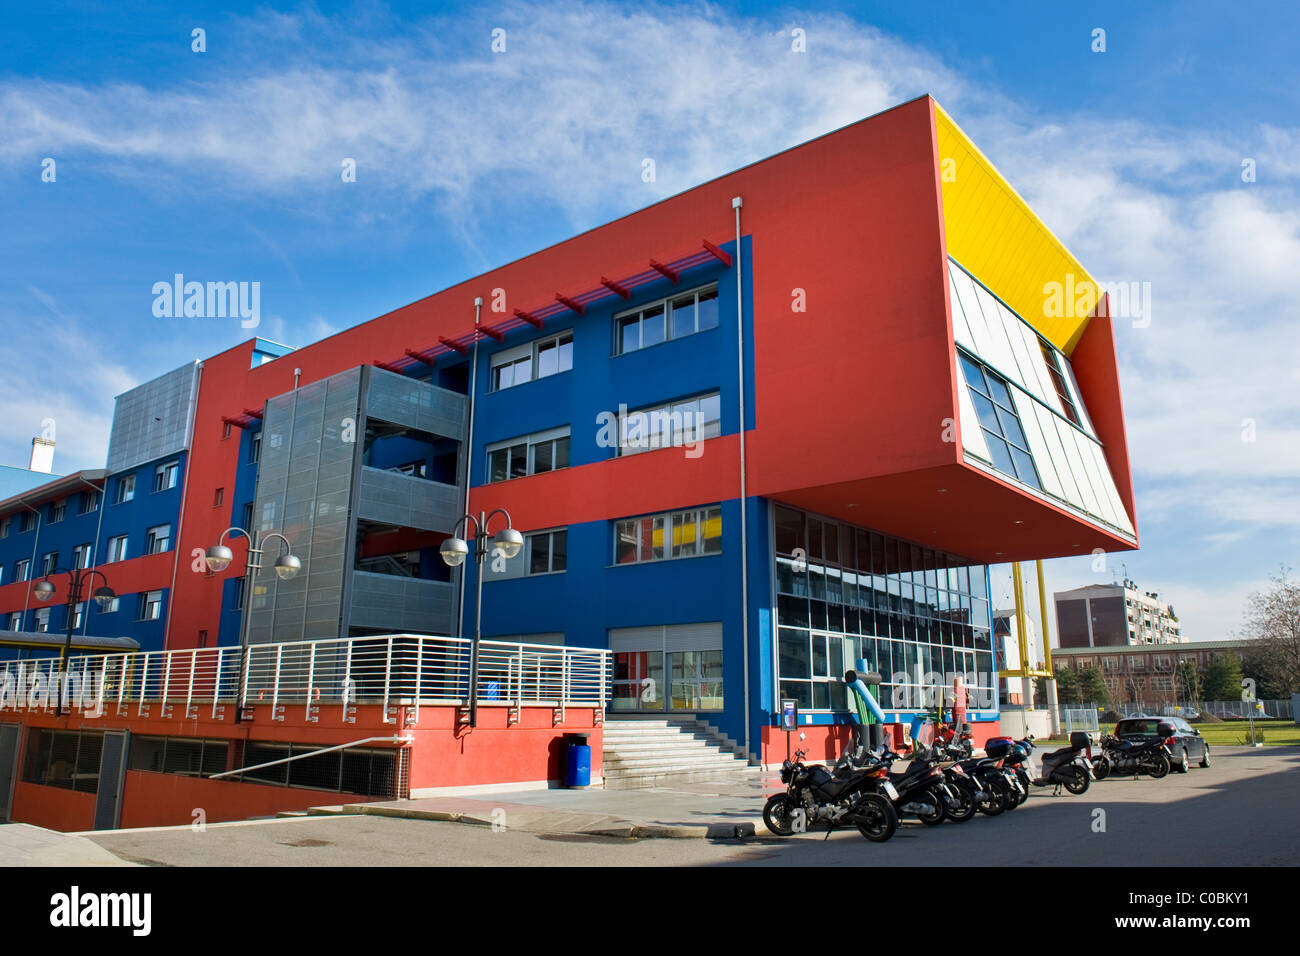 Faculty of design politecnico campus bovisa milan italy for Politecnico design